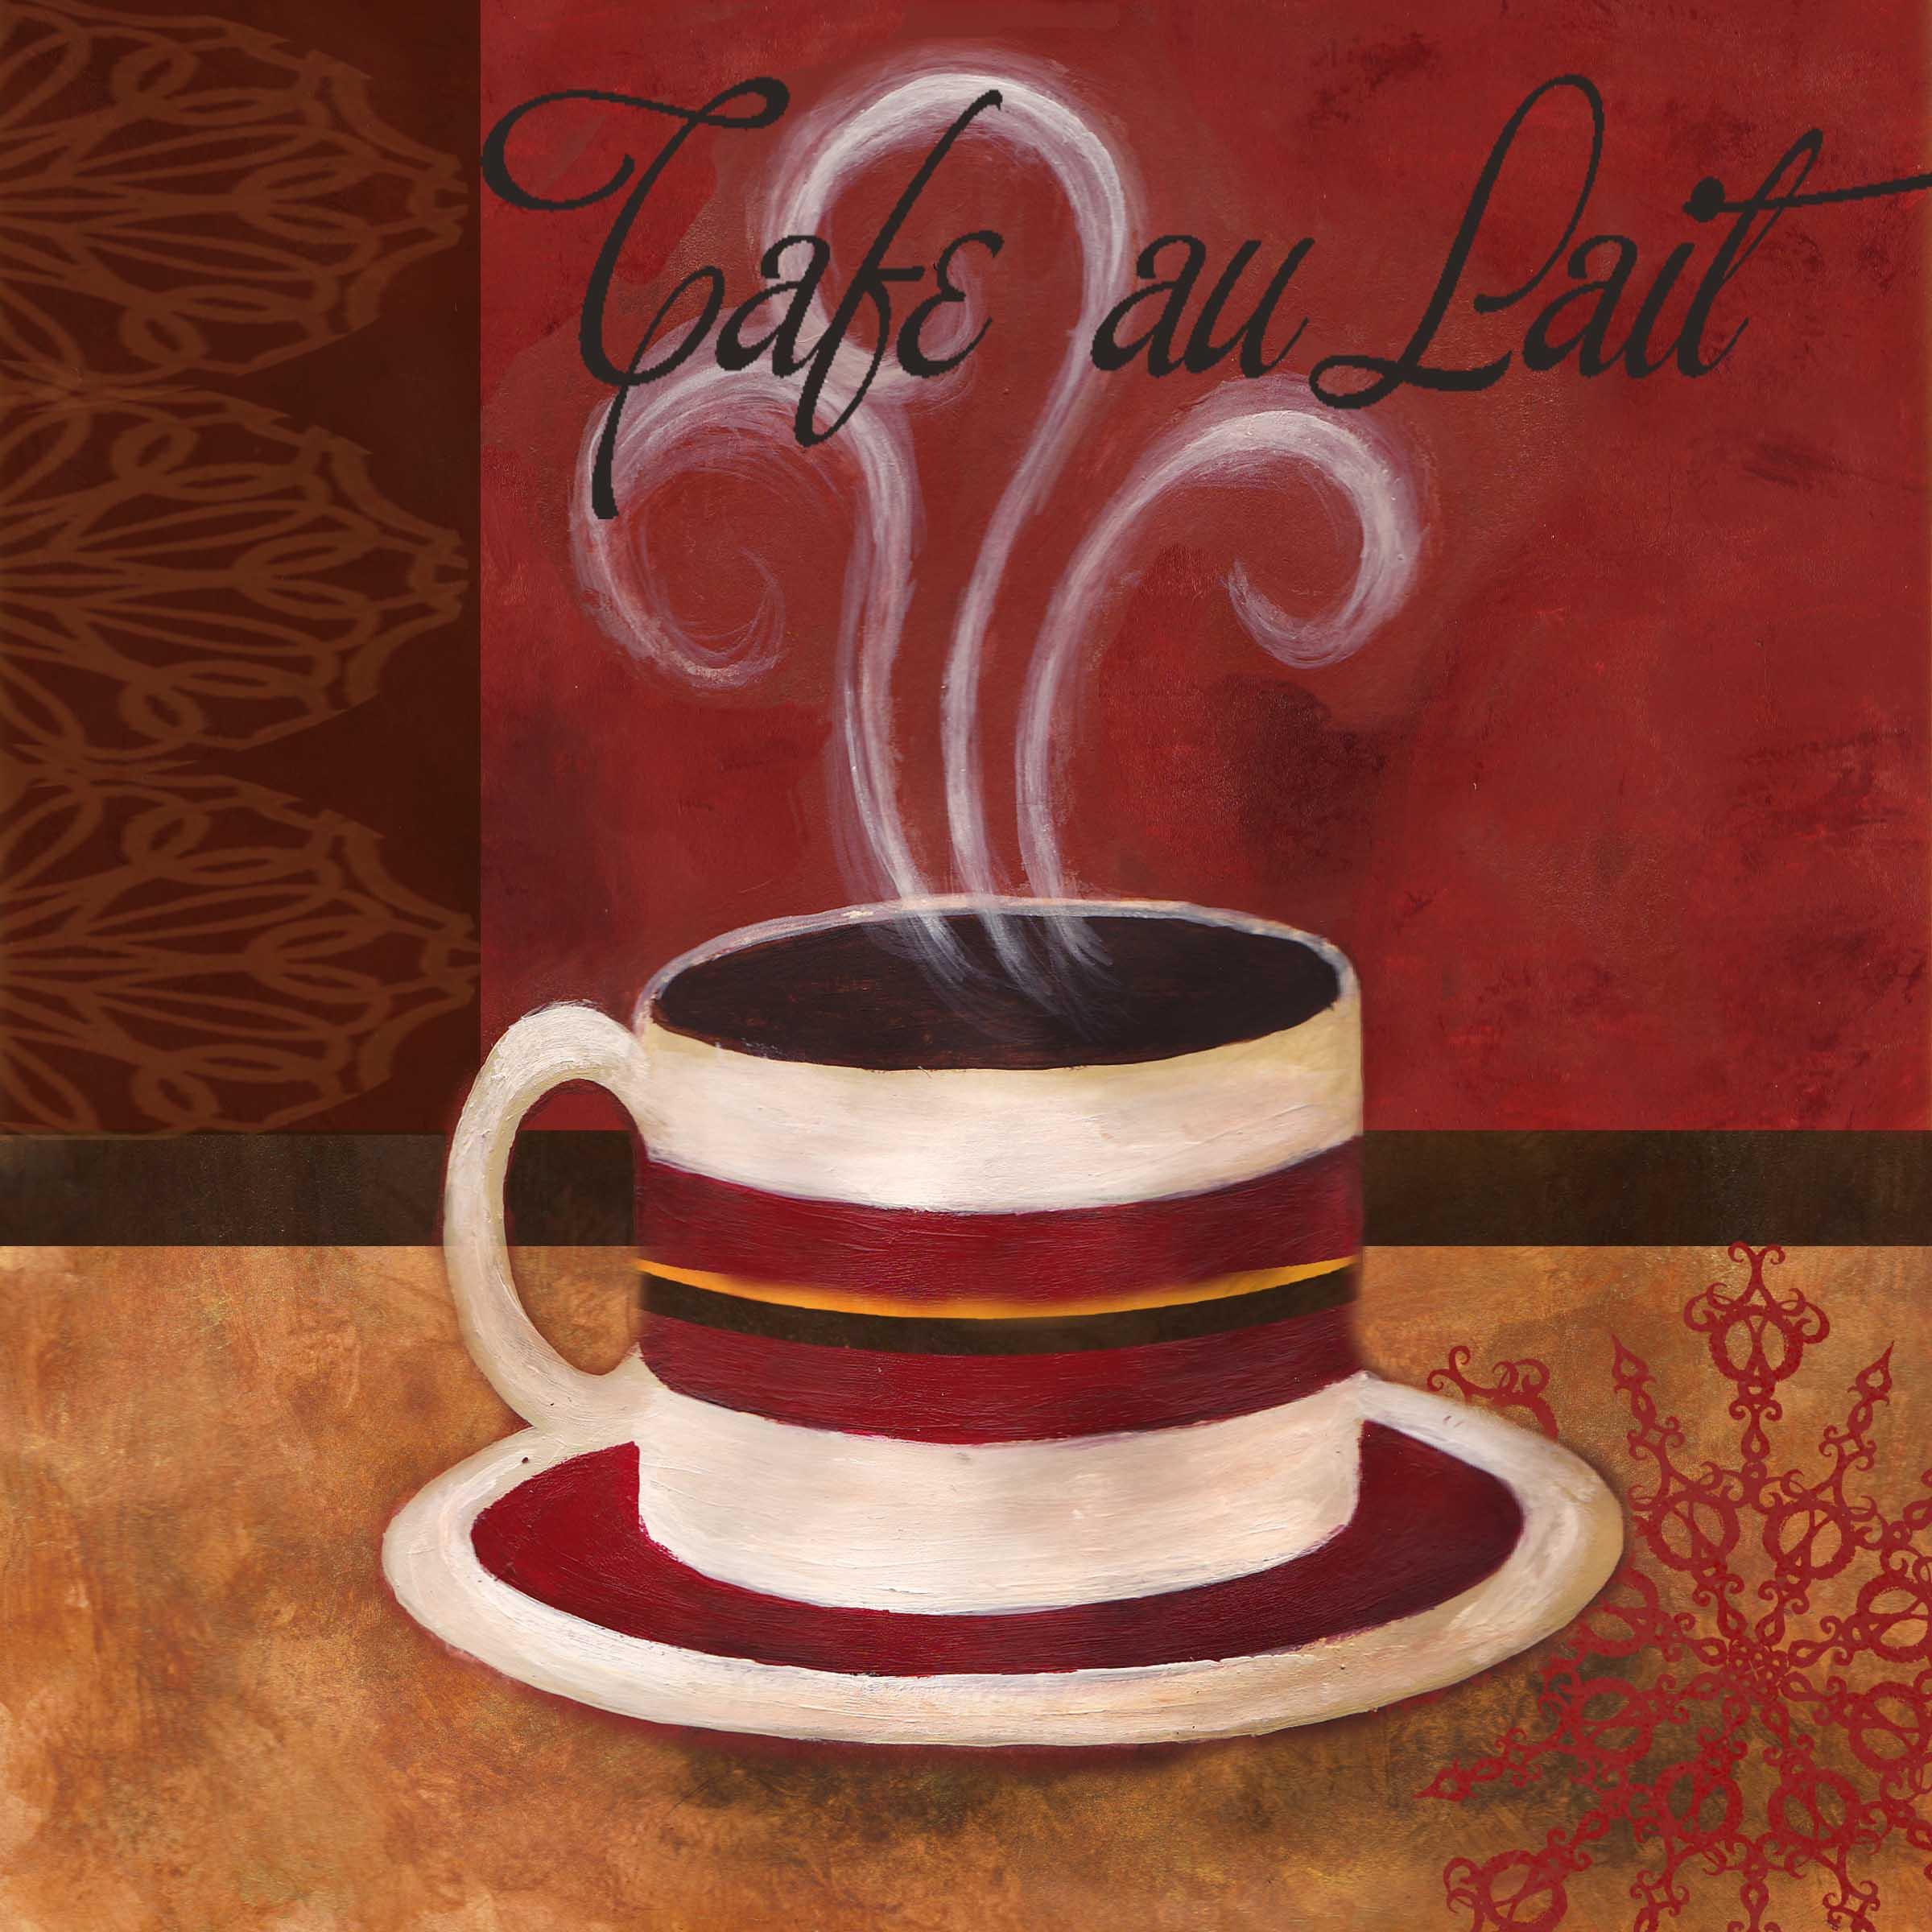 download filled in uncategorized title cafe au lait kitchen decor